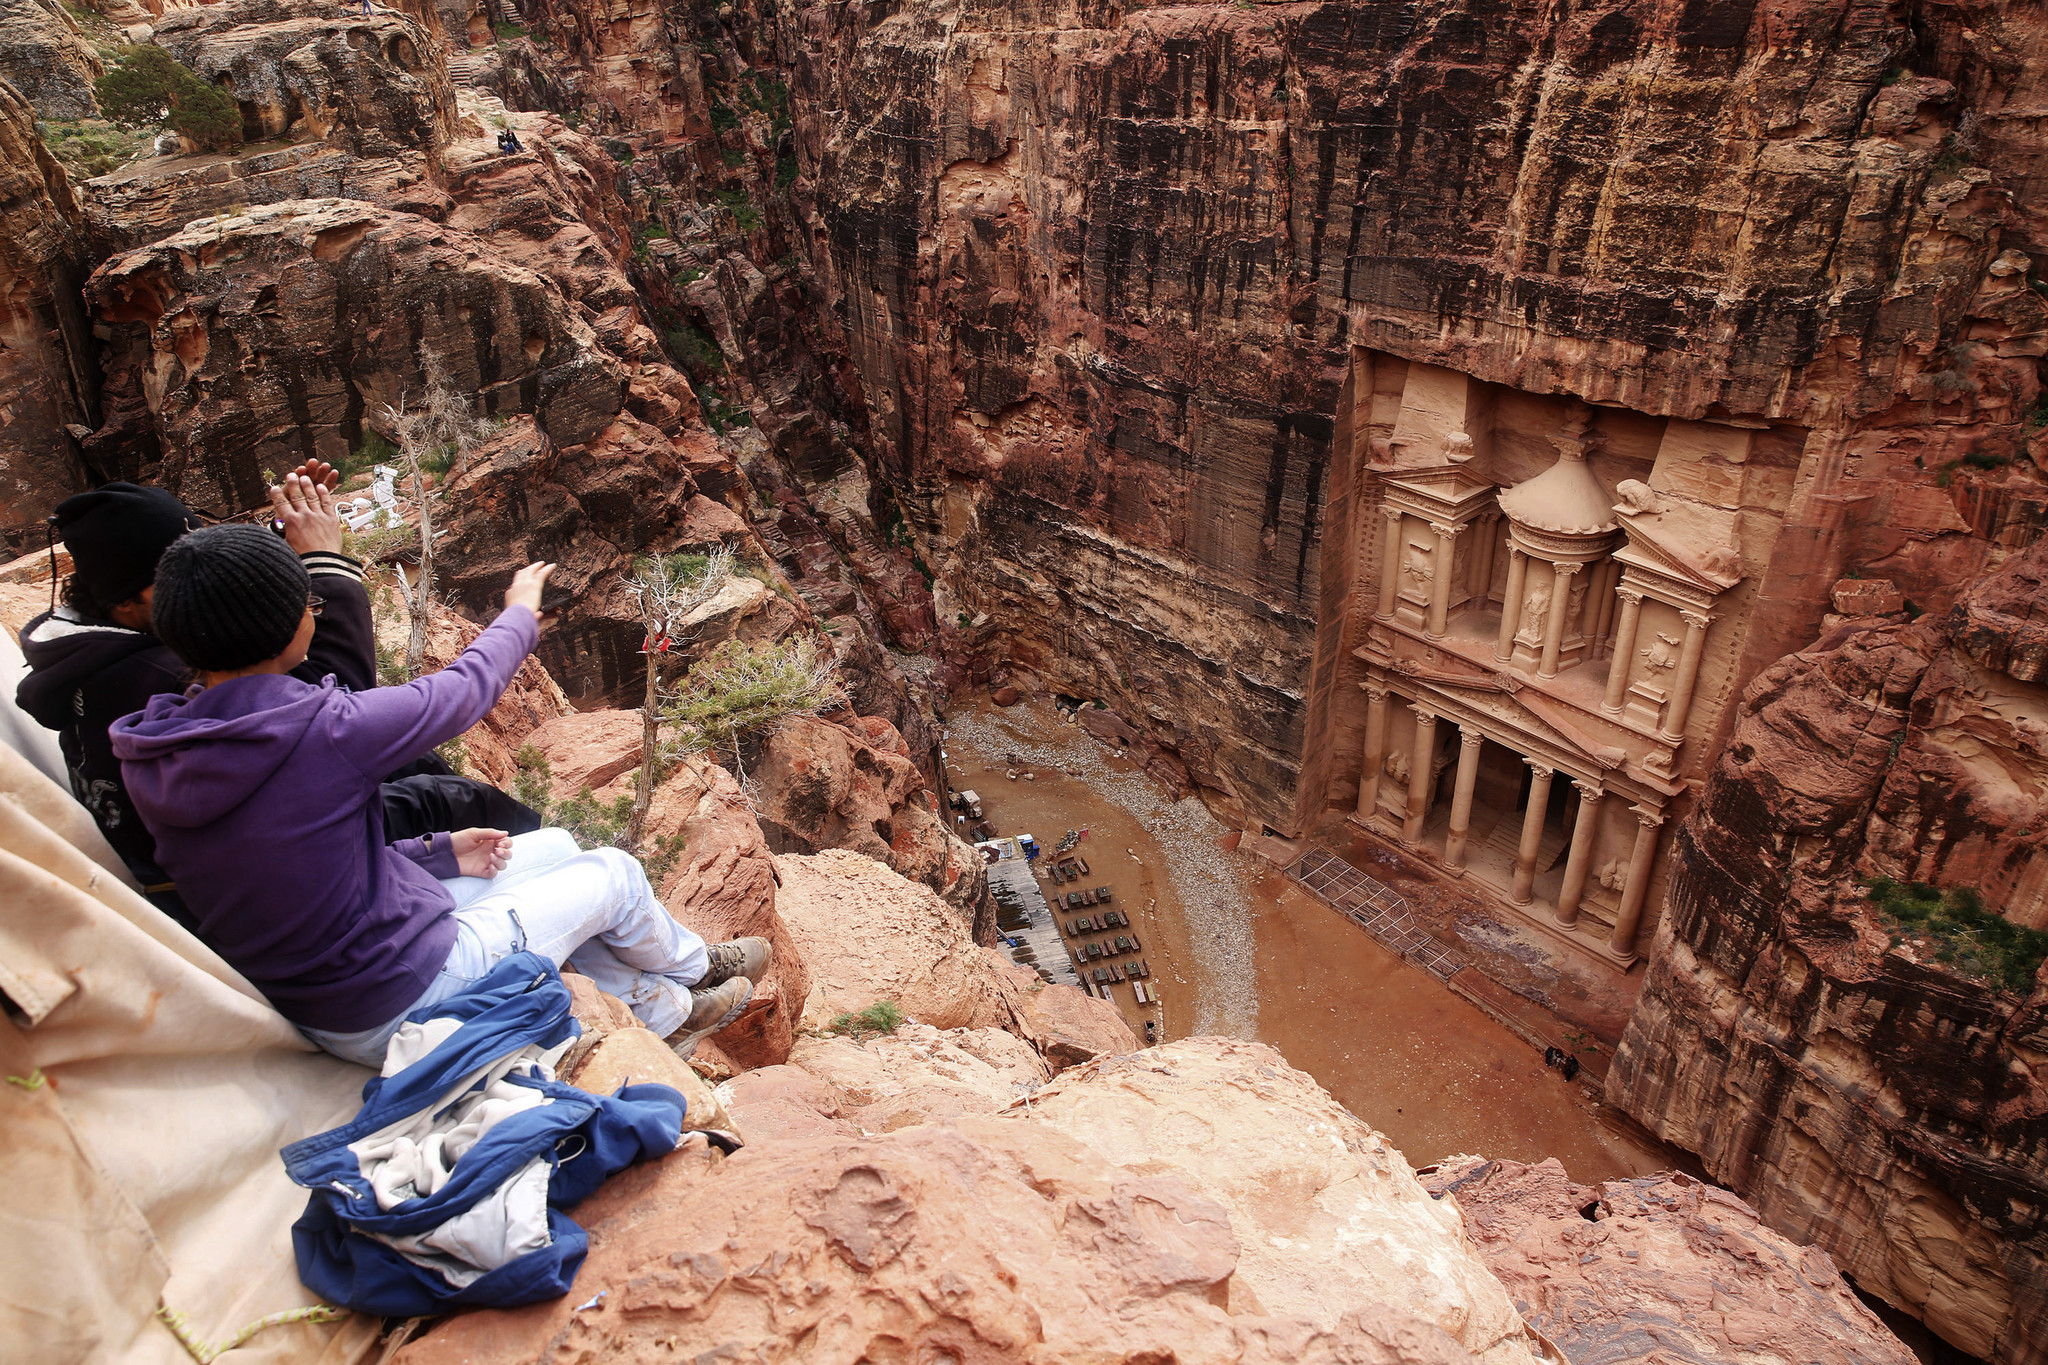 Falling rock kills Italian tourist in Jordan